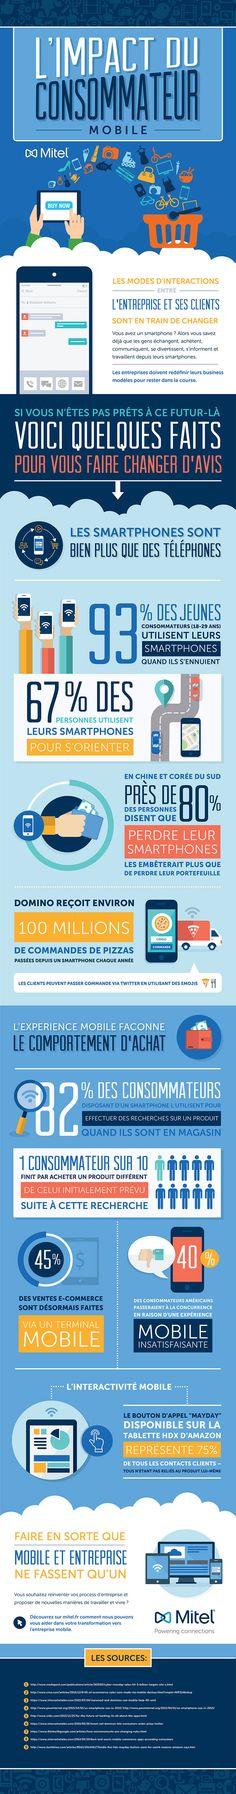 L'impact du consommateur mobile - Infographie-Mobile-Consumer Inbound Marketing, Marketing Data, Mobile Marketing, Business Marketing, Content Marketing, Internet Marketing, Online Marketing, Digital Marketing, Lead Generation